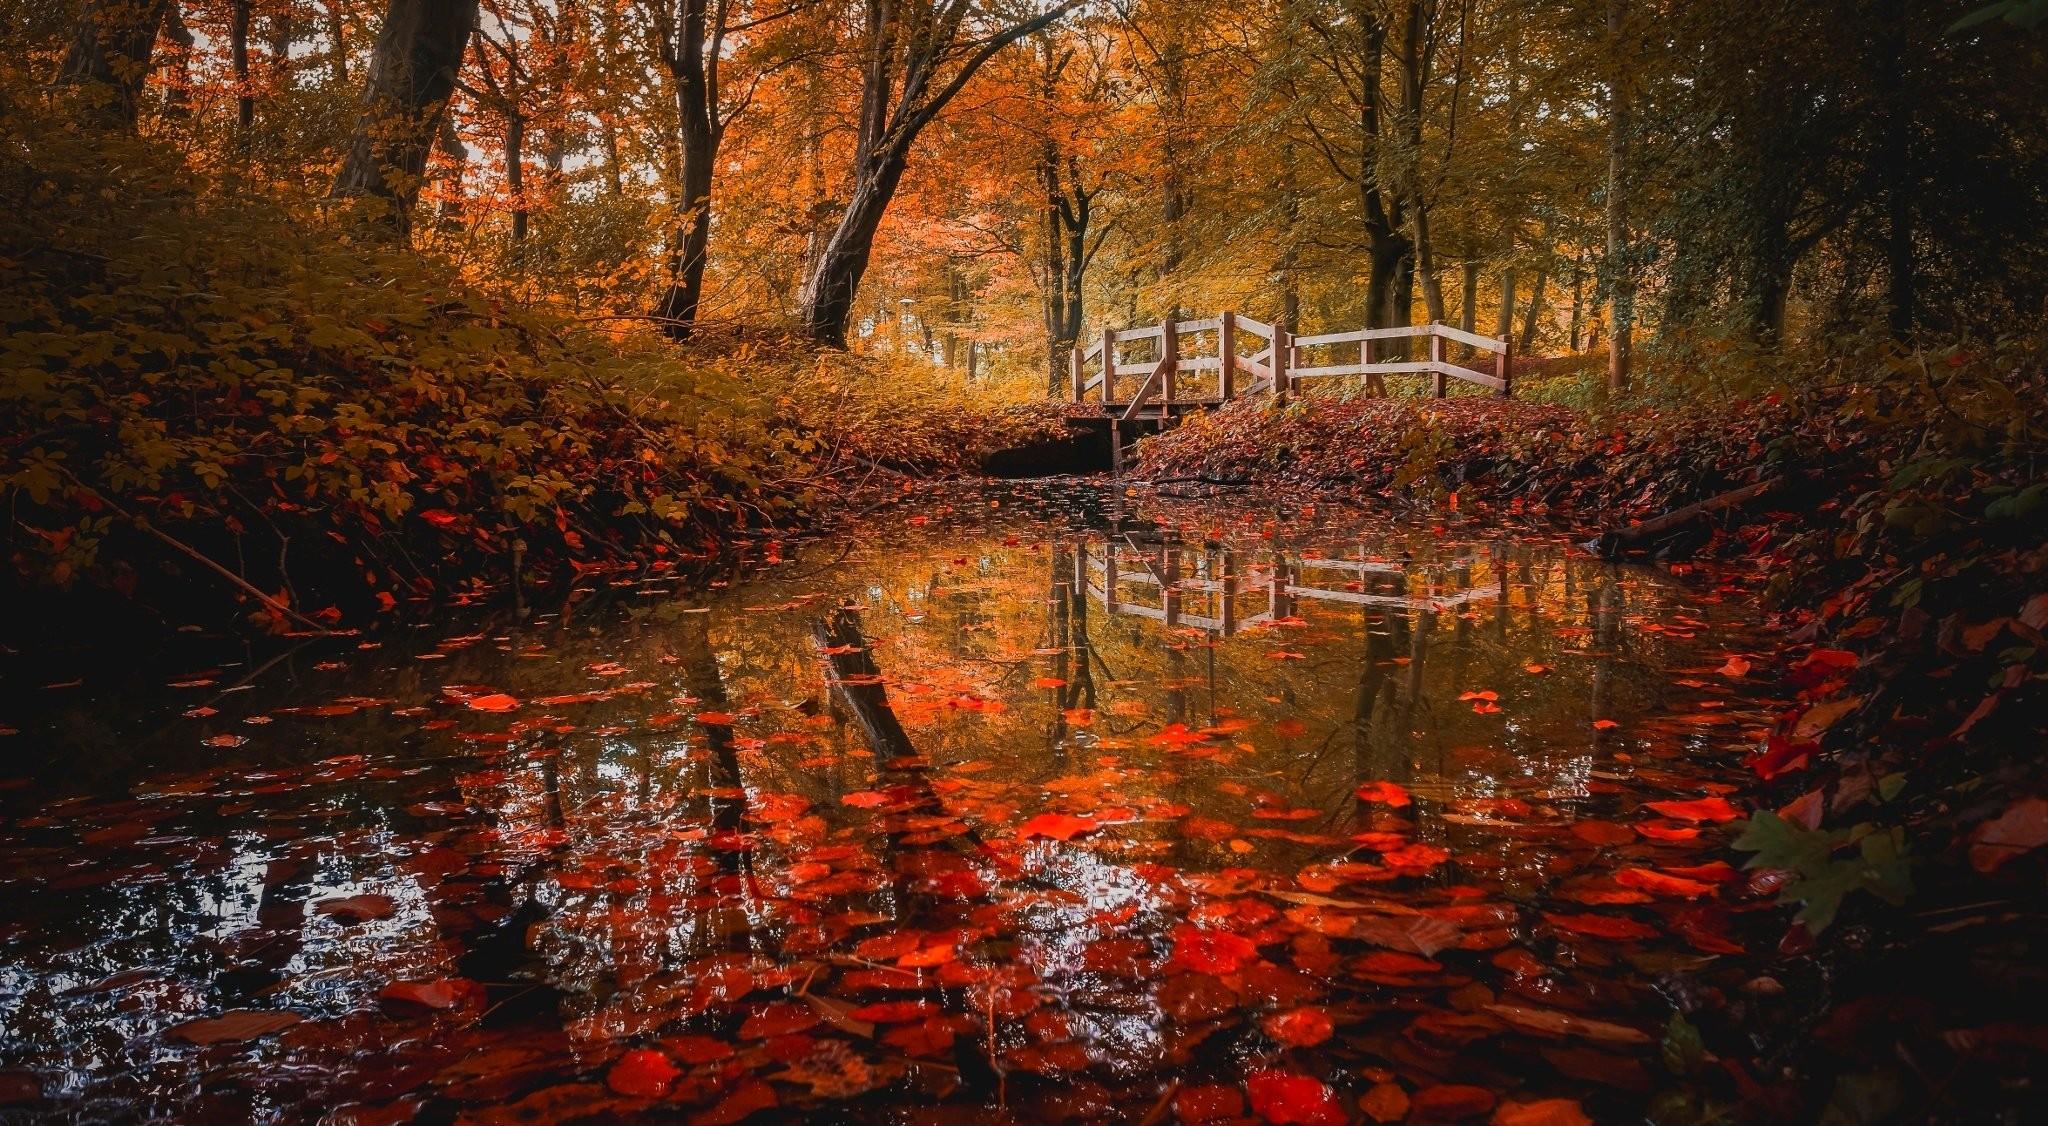 Leavescool Images Forest Fallautumn Bridge Landscape Leaf 2048x1126